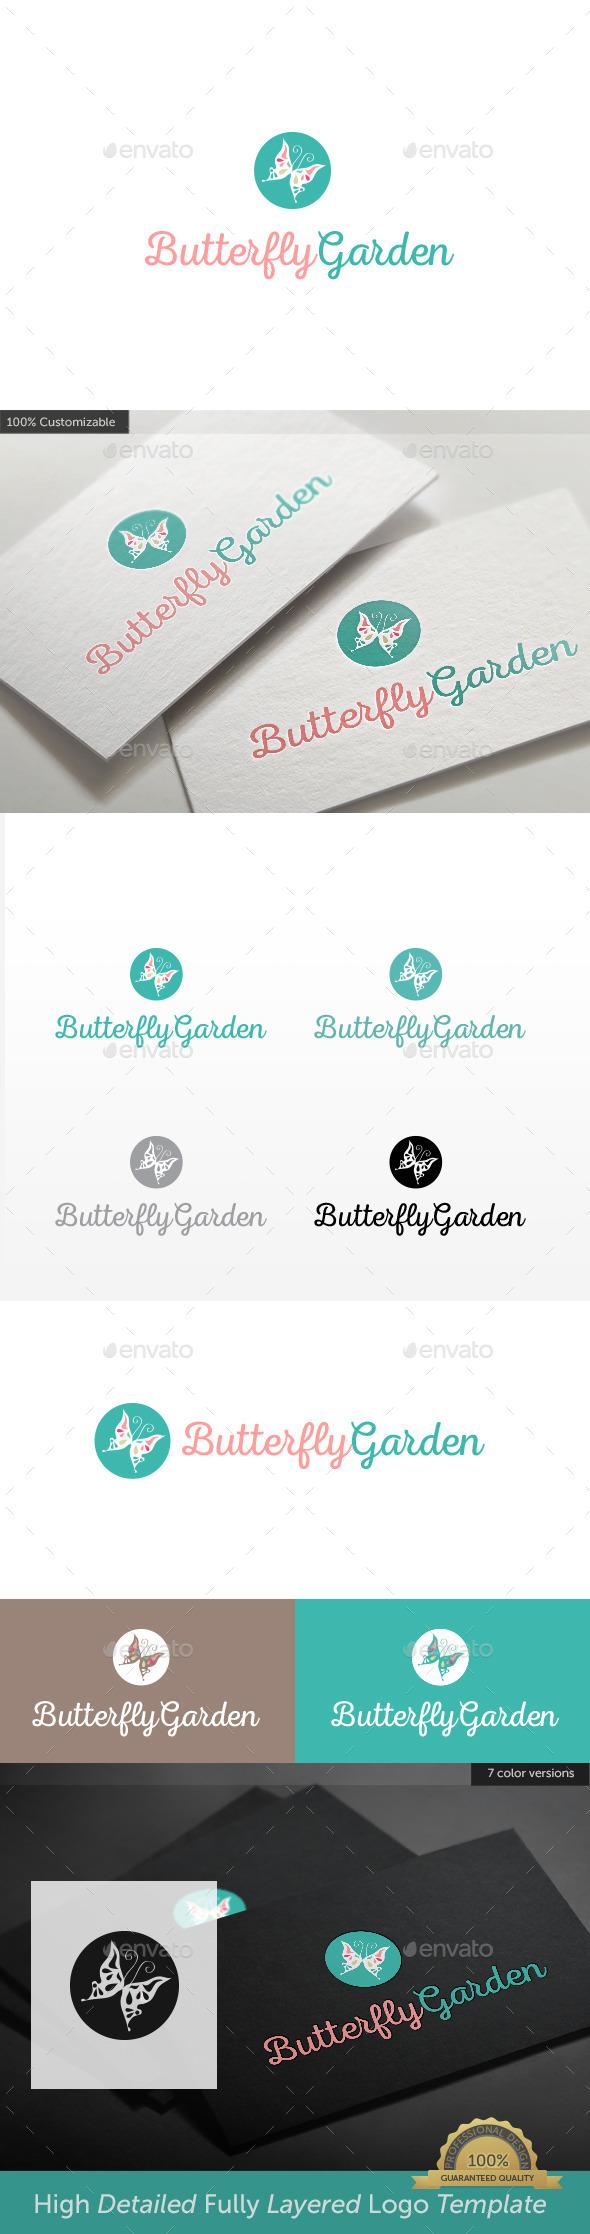 GraphicRiver Butterfly Garden Logo 11300174